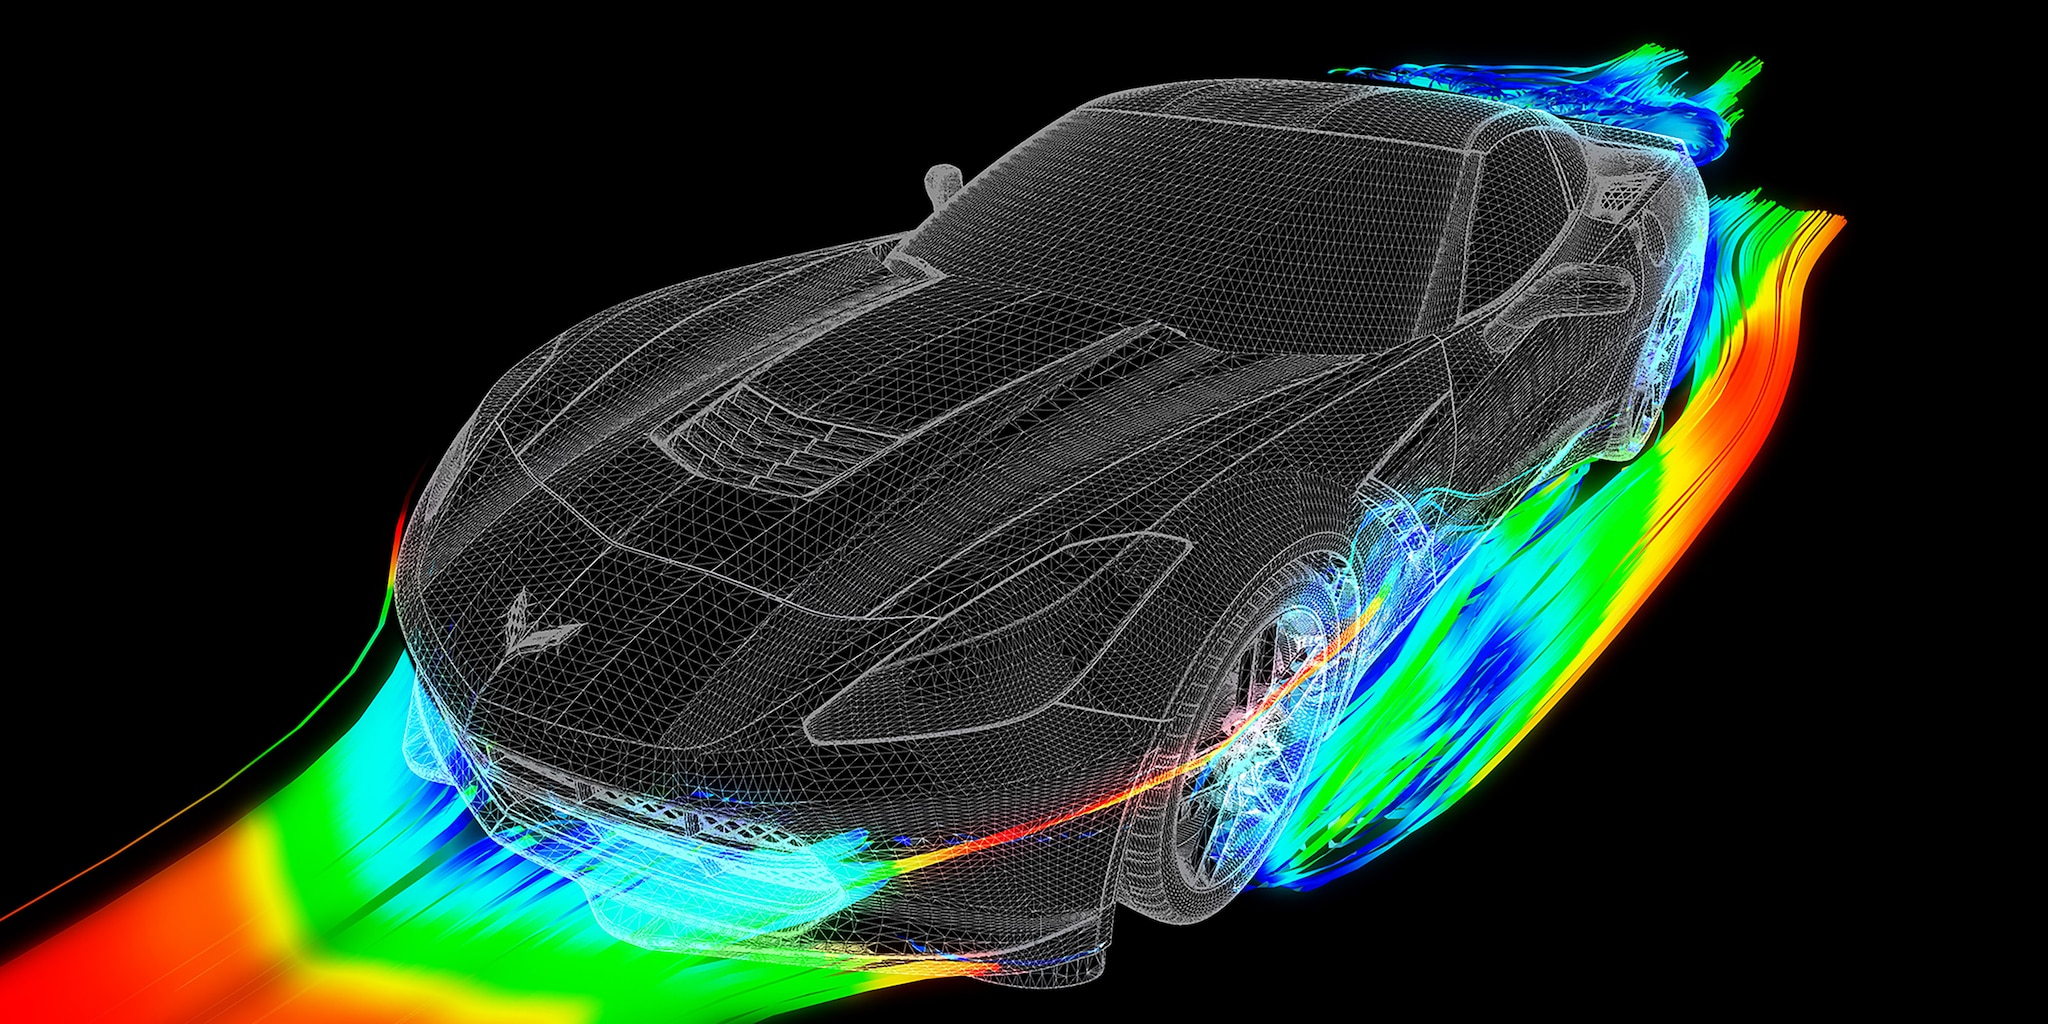 Diseño del auto deportivo Corvette Stingray 2019: Aerodinámica